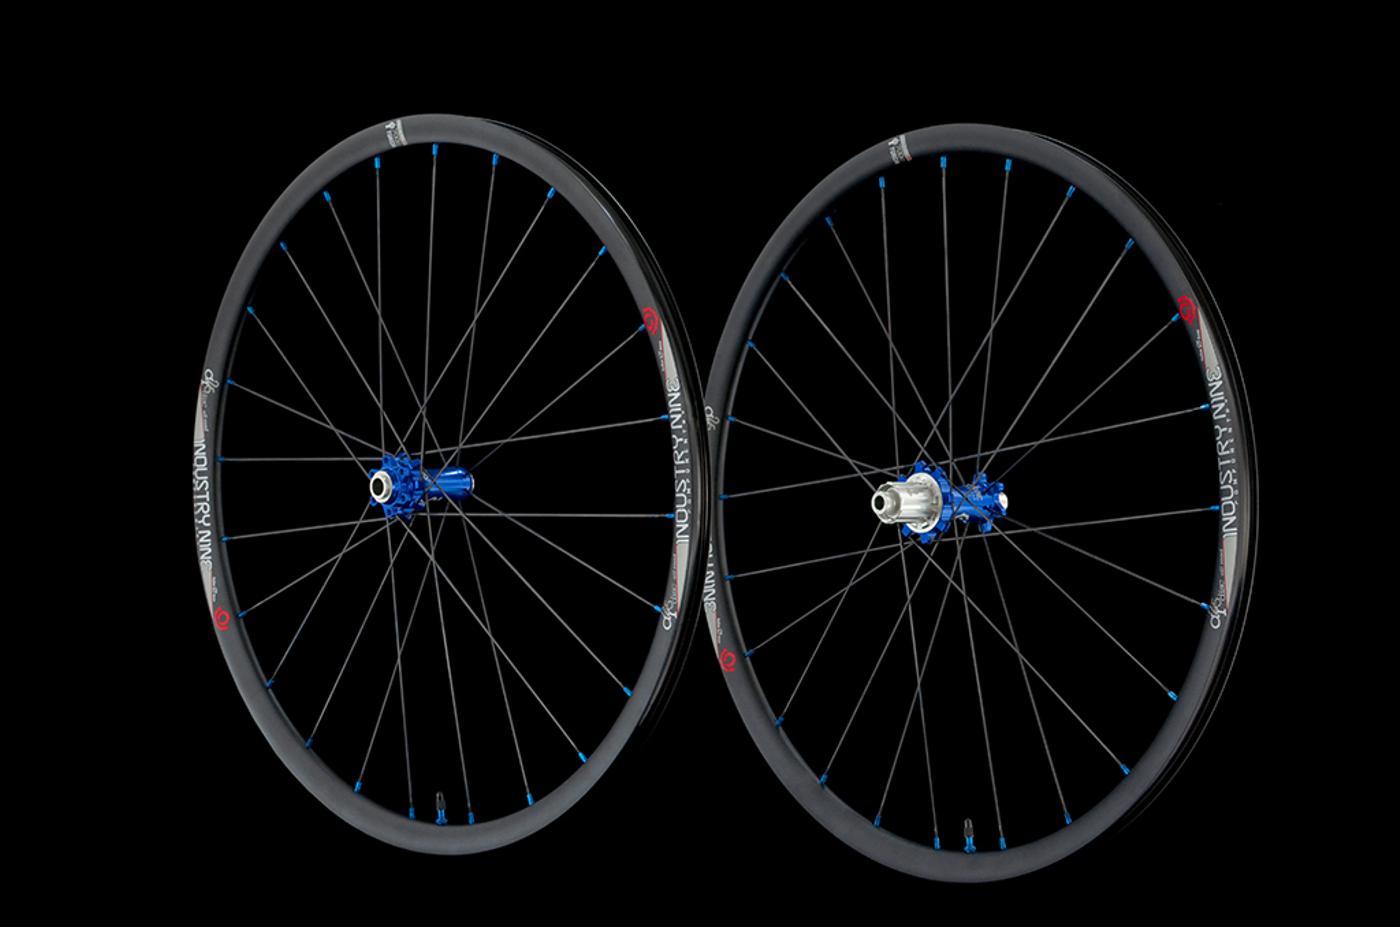 Industry Nine's AR23 All-Road Wheels